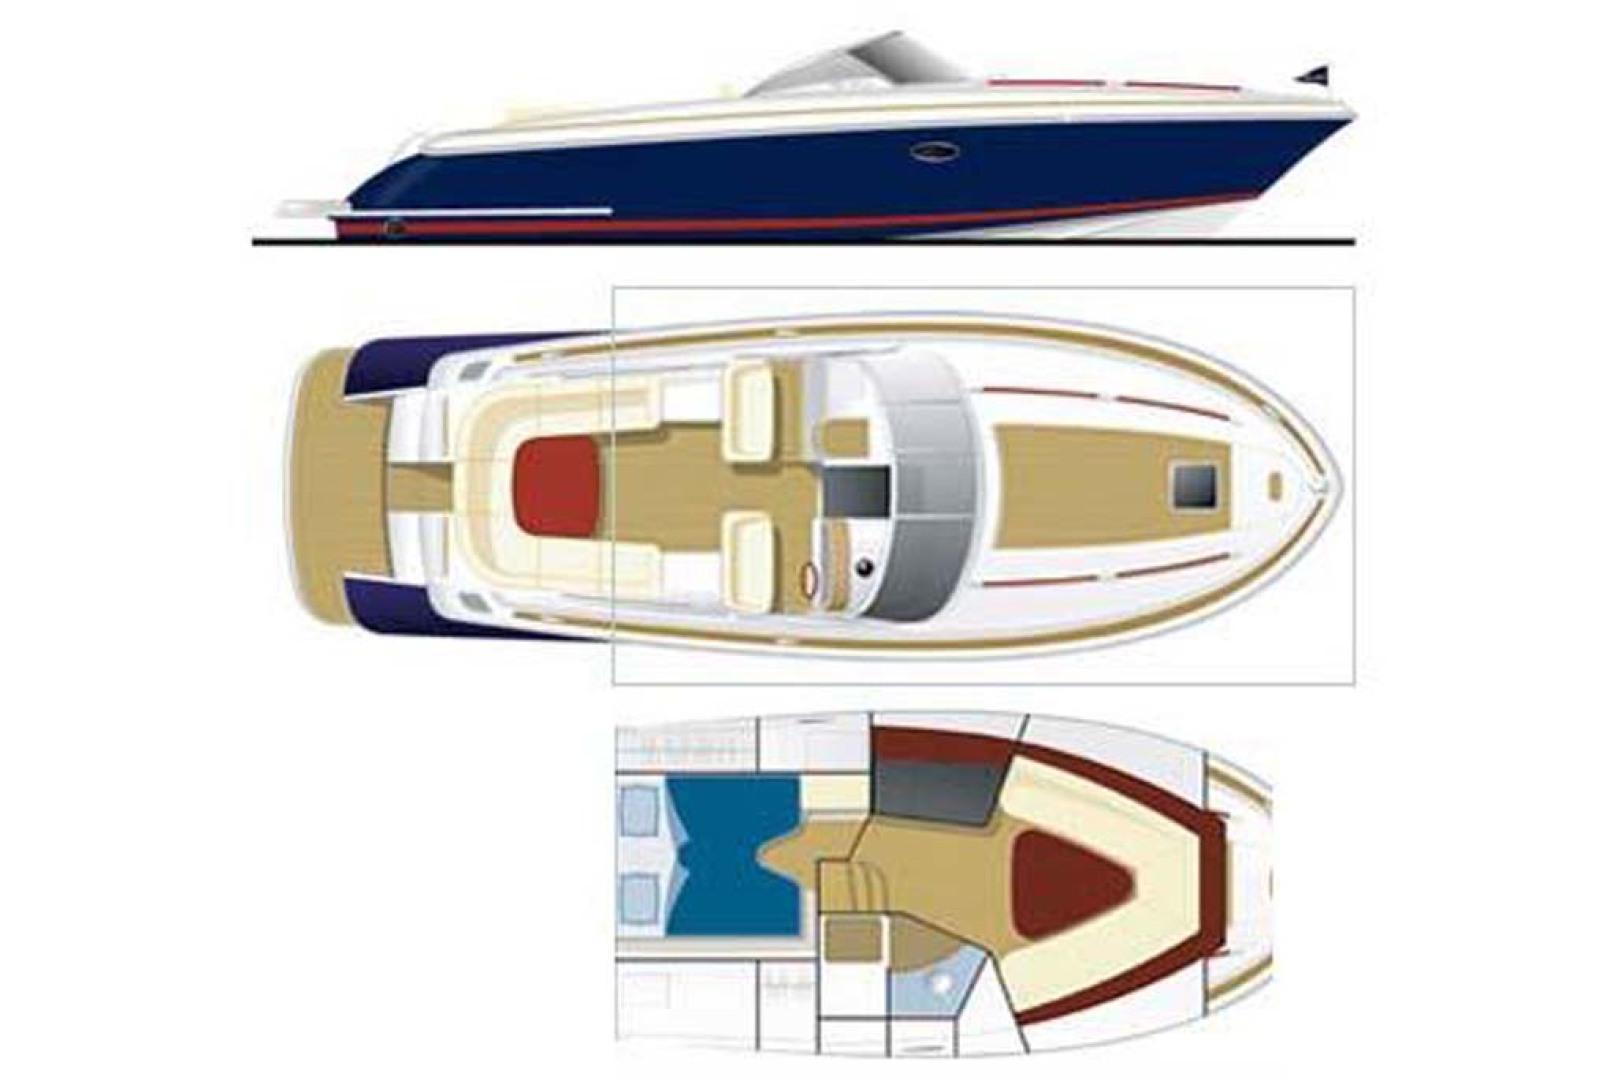 Chris-Craft-Corsair 36 2013-La Dolce Vita Fort Lauderdale-Florida-United States-Line Drawing-1074562 | Thumbnail